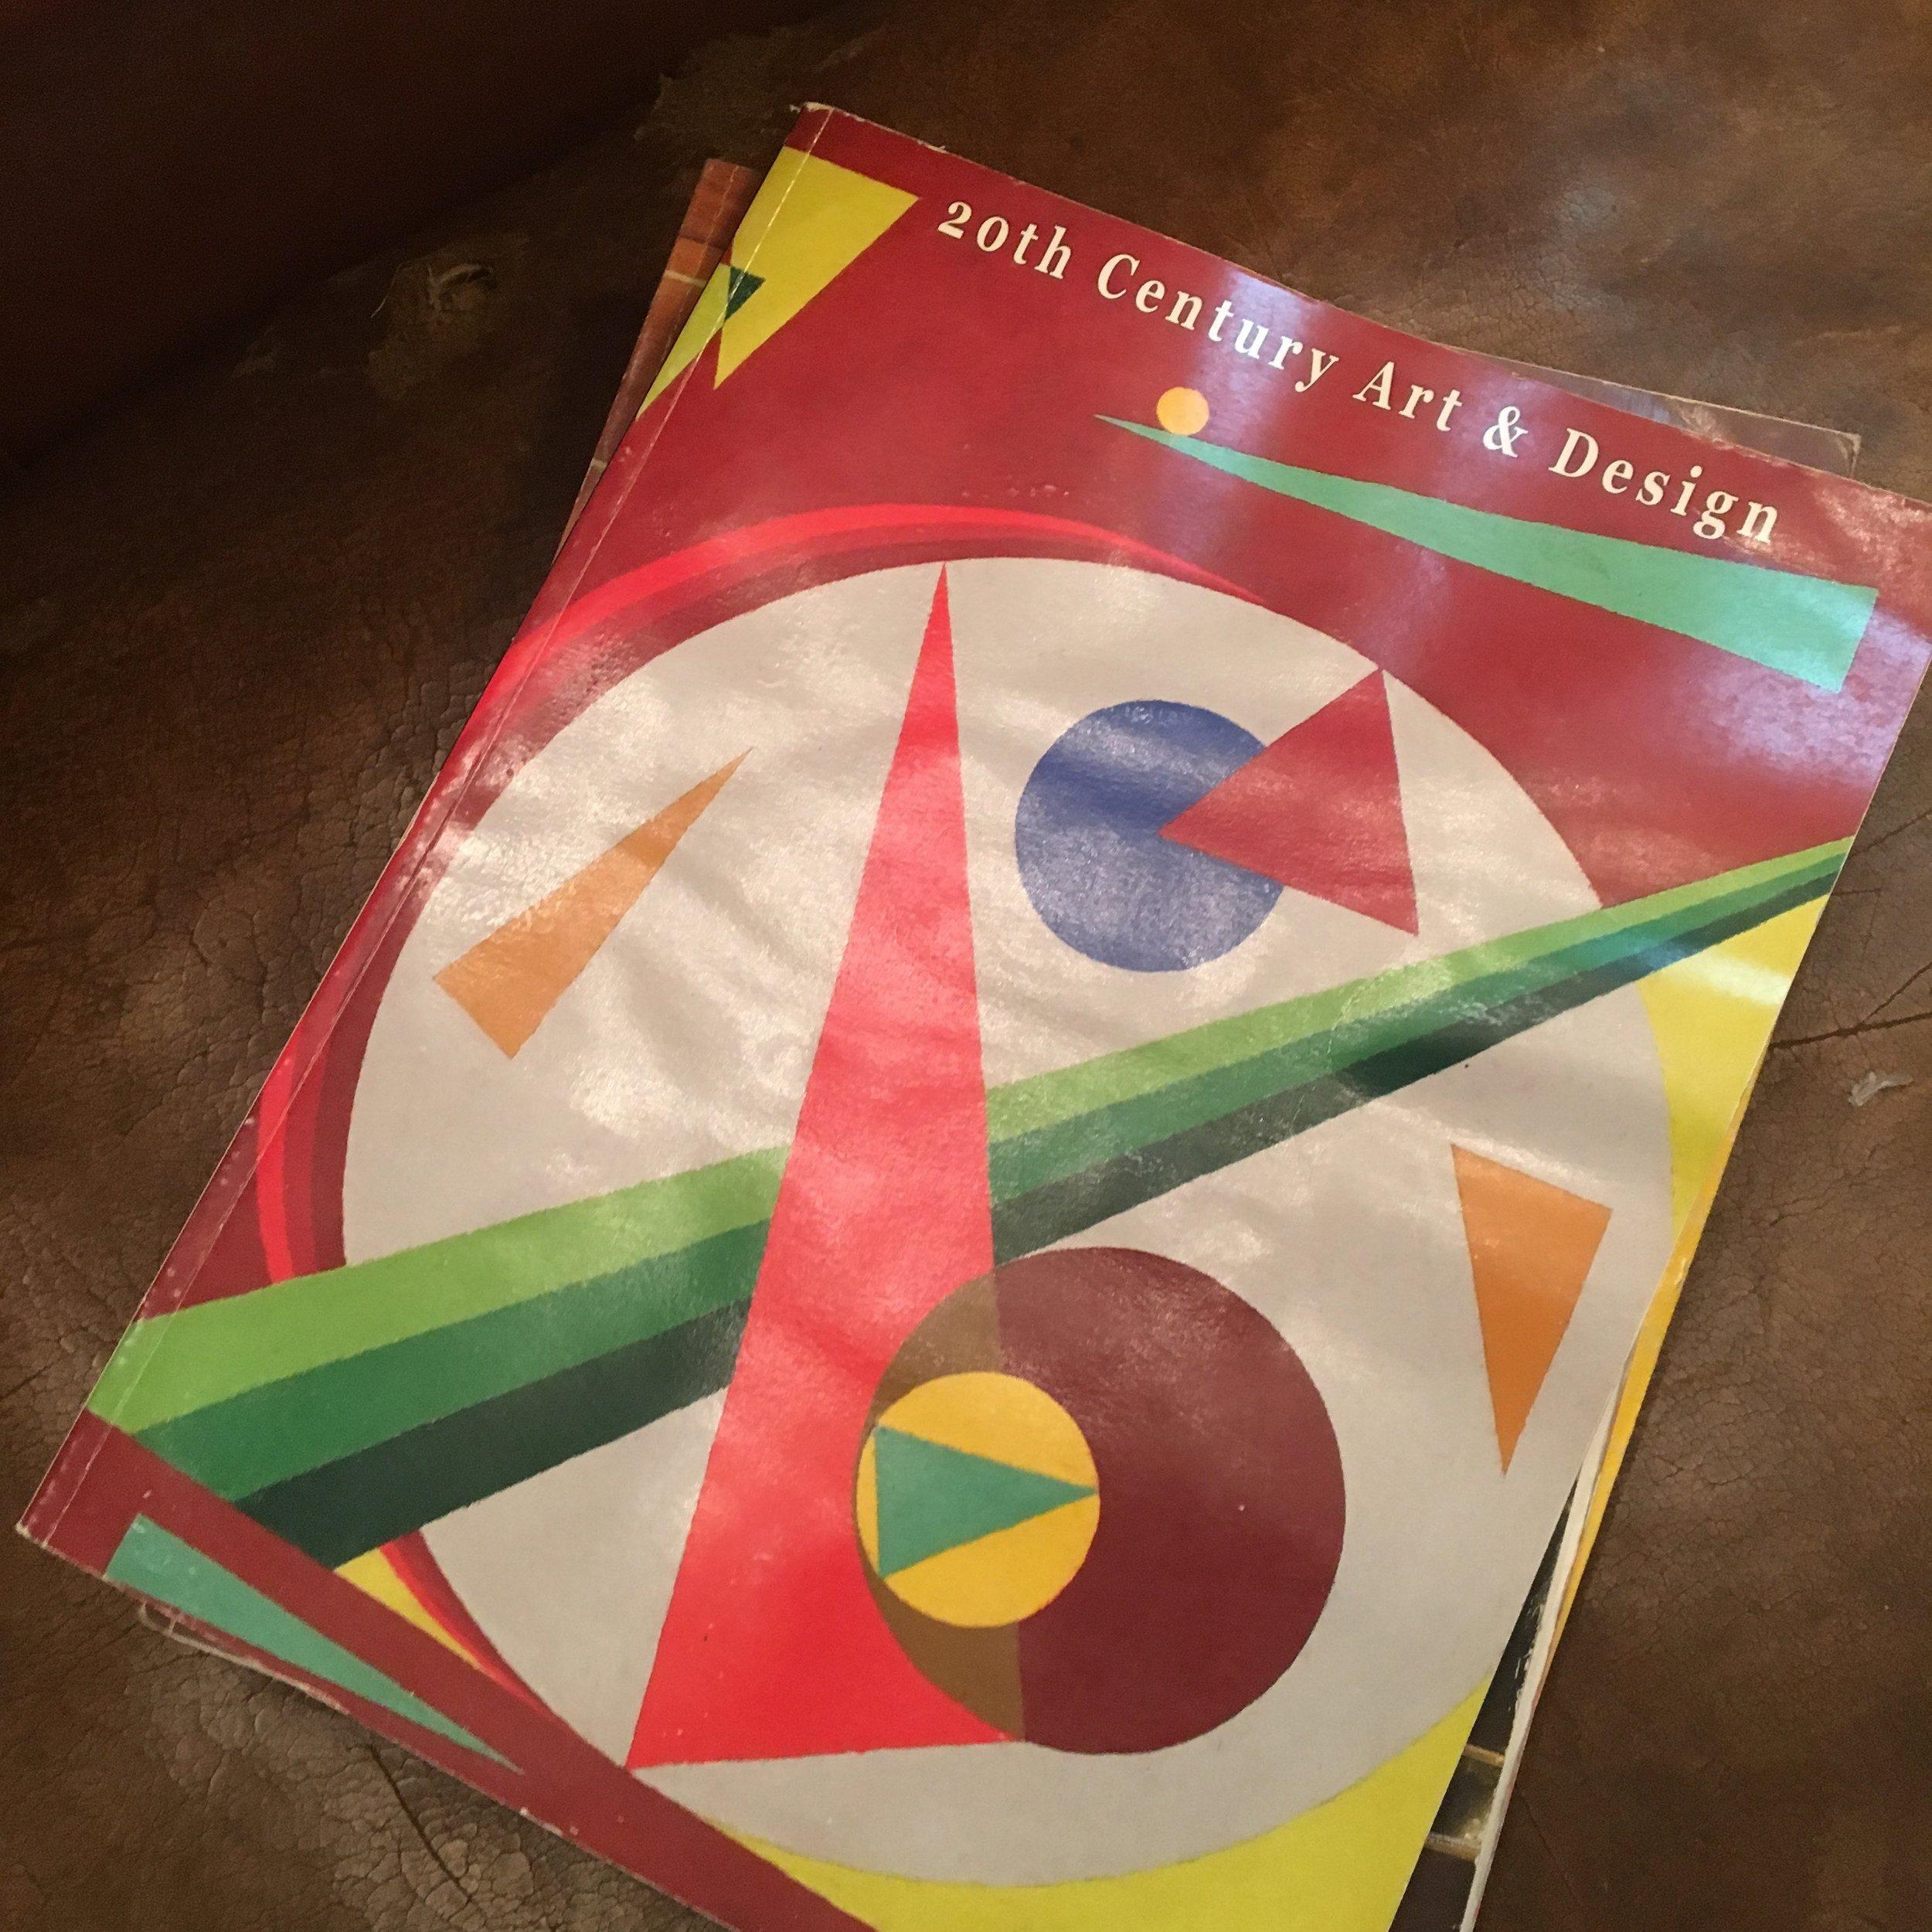 Gotta Graphic Designer in the family? Give them vintage graphic design books.